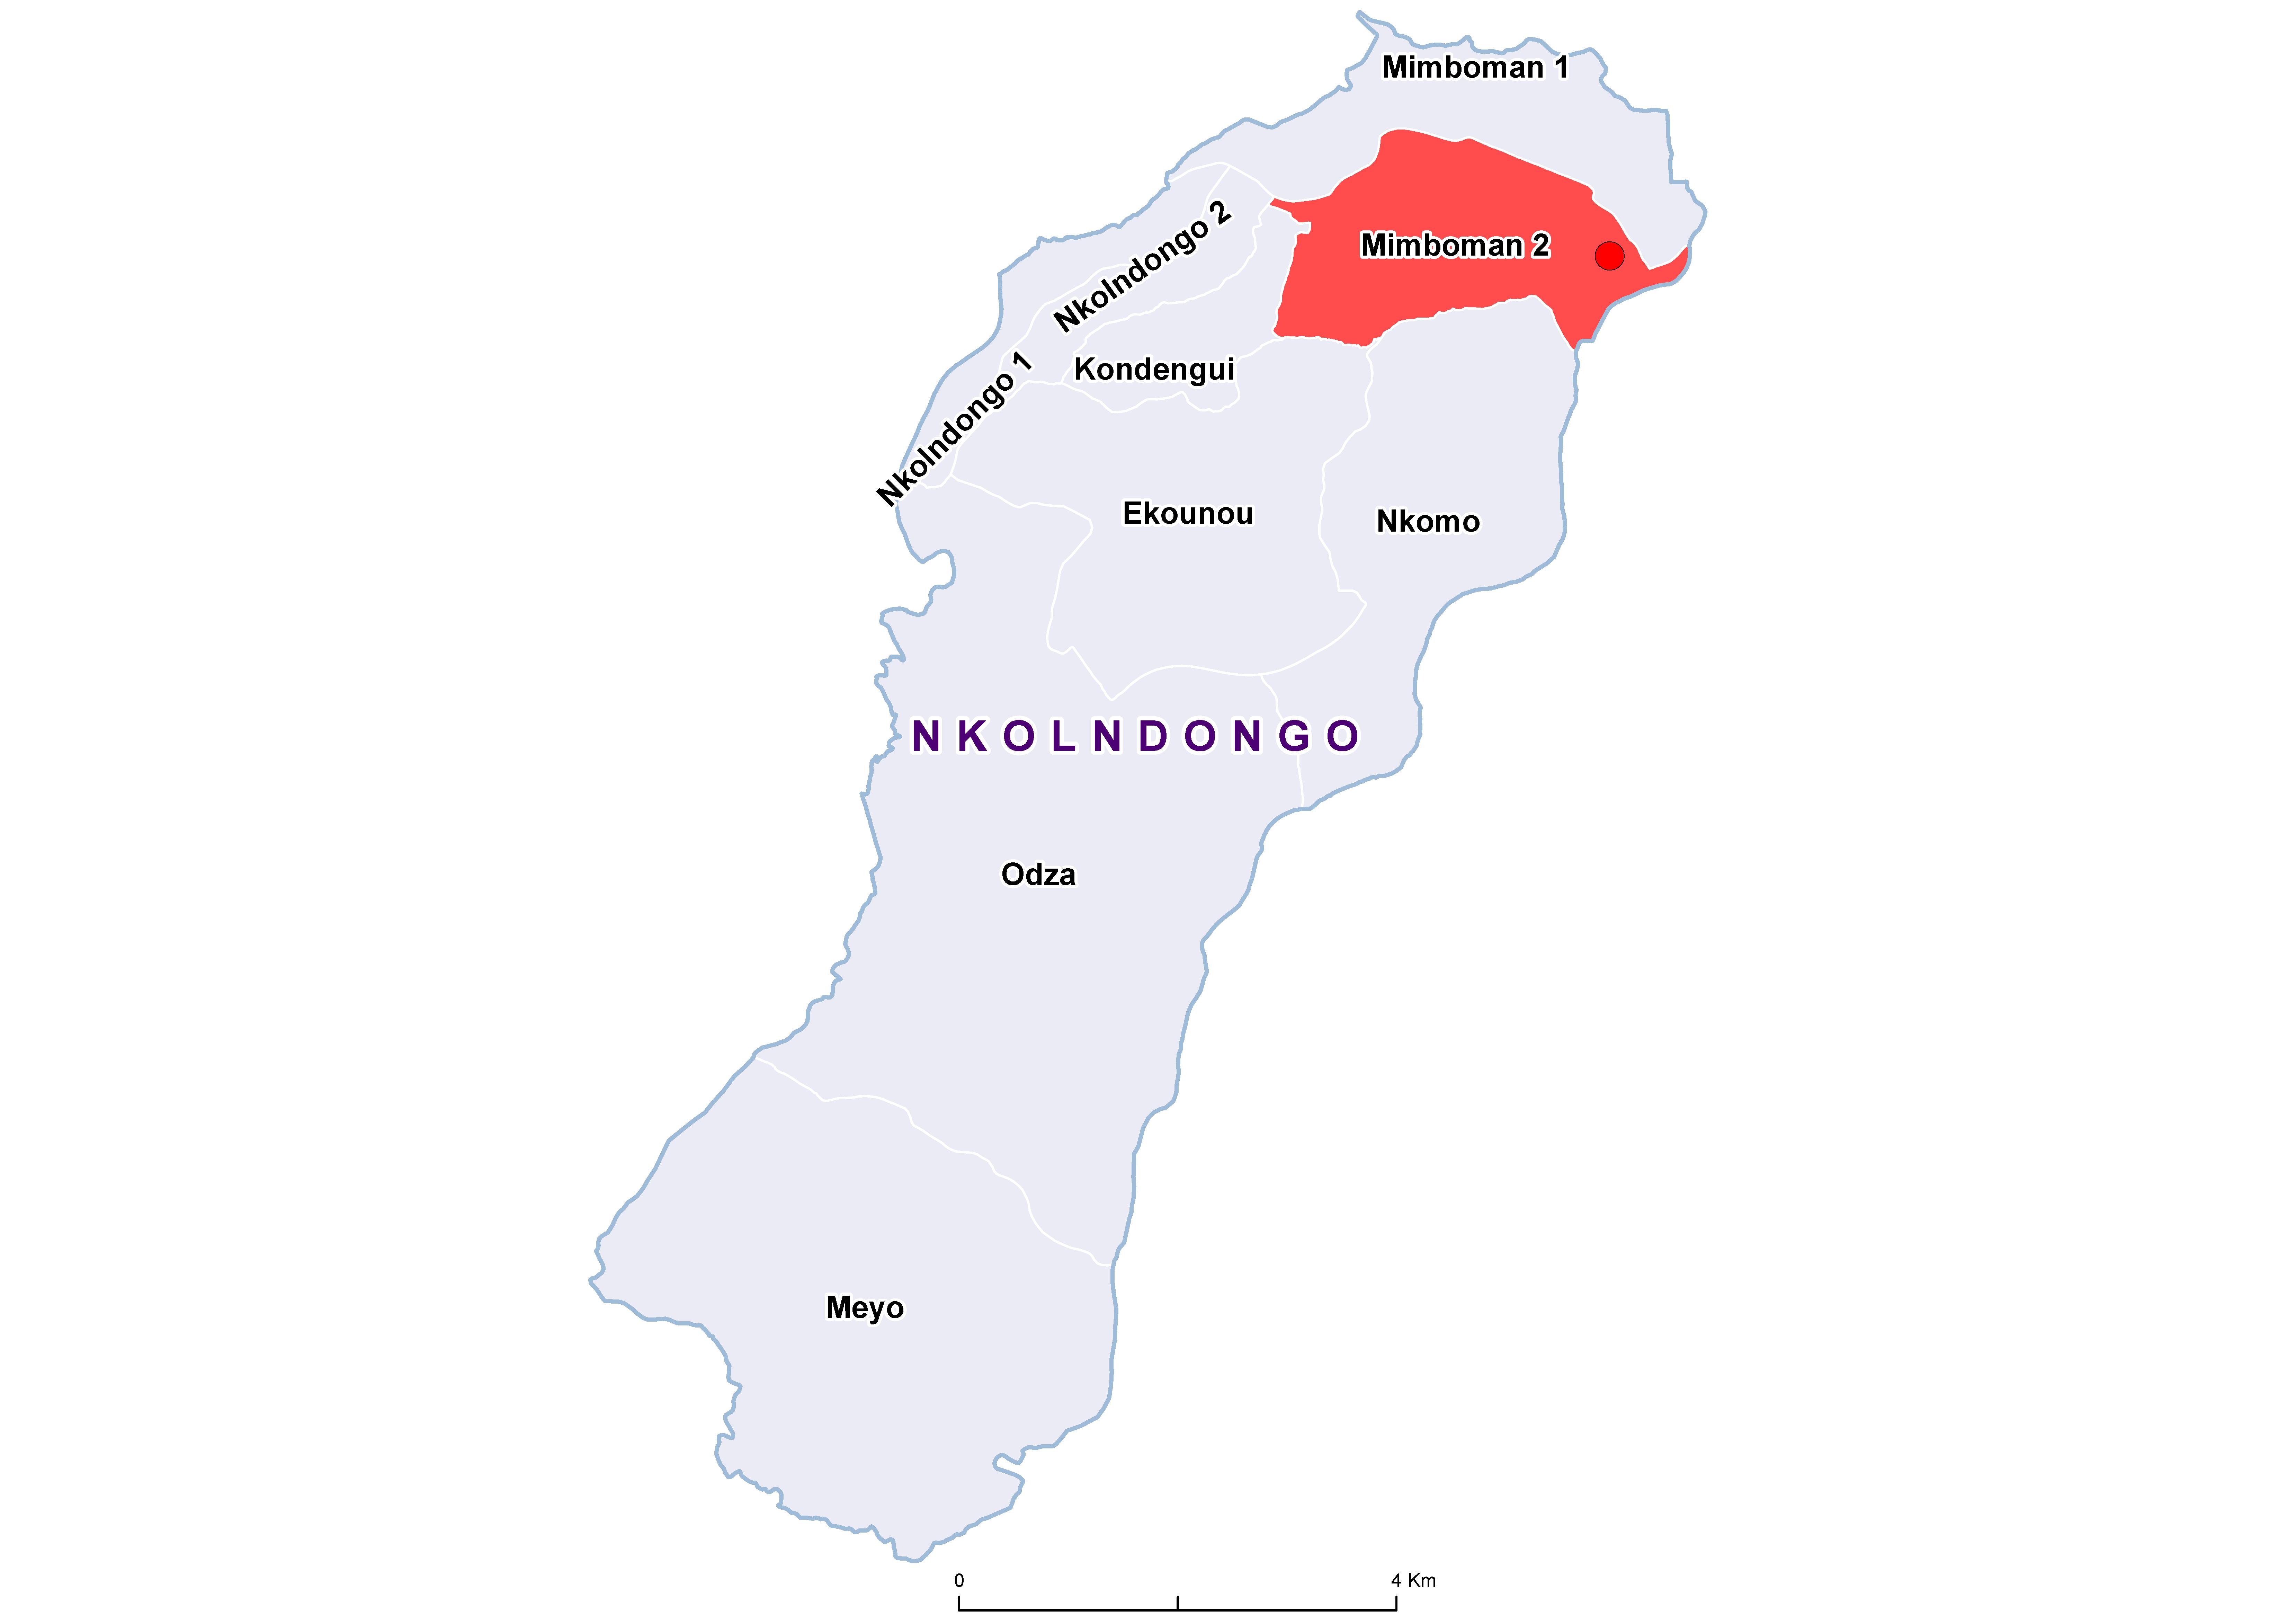 Nkolndongo SCH 20100001